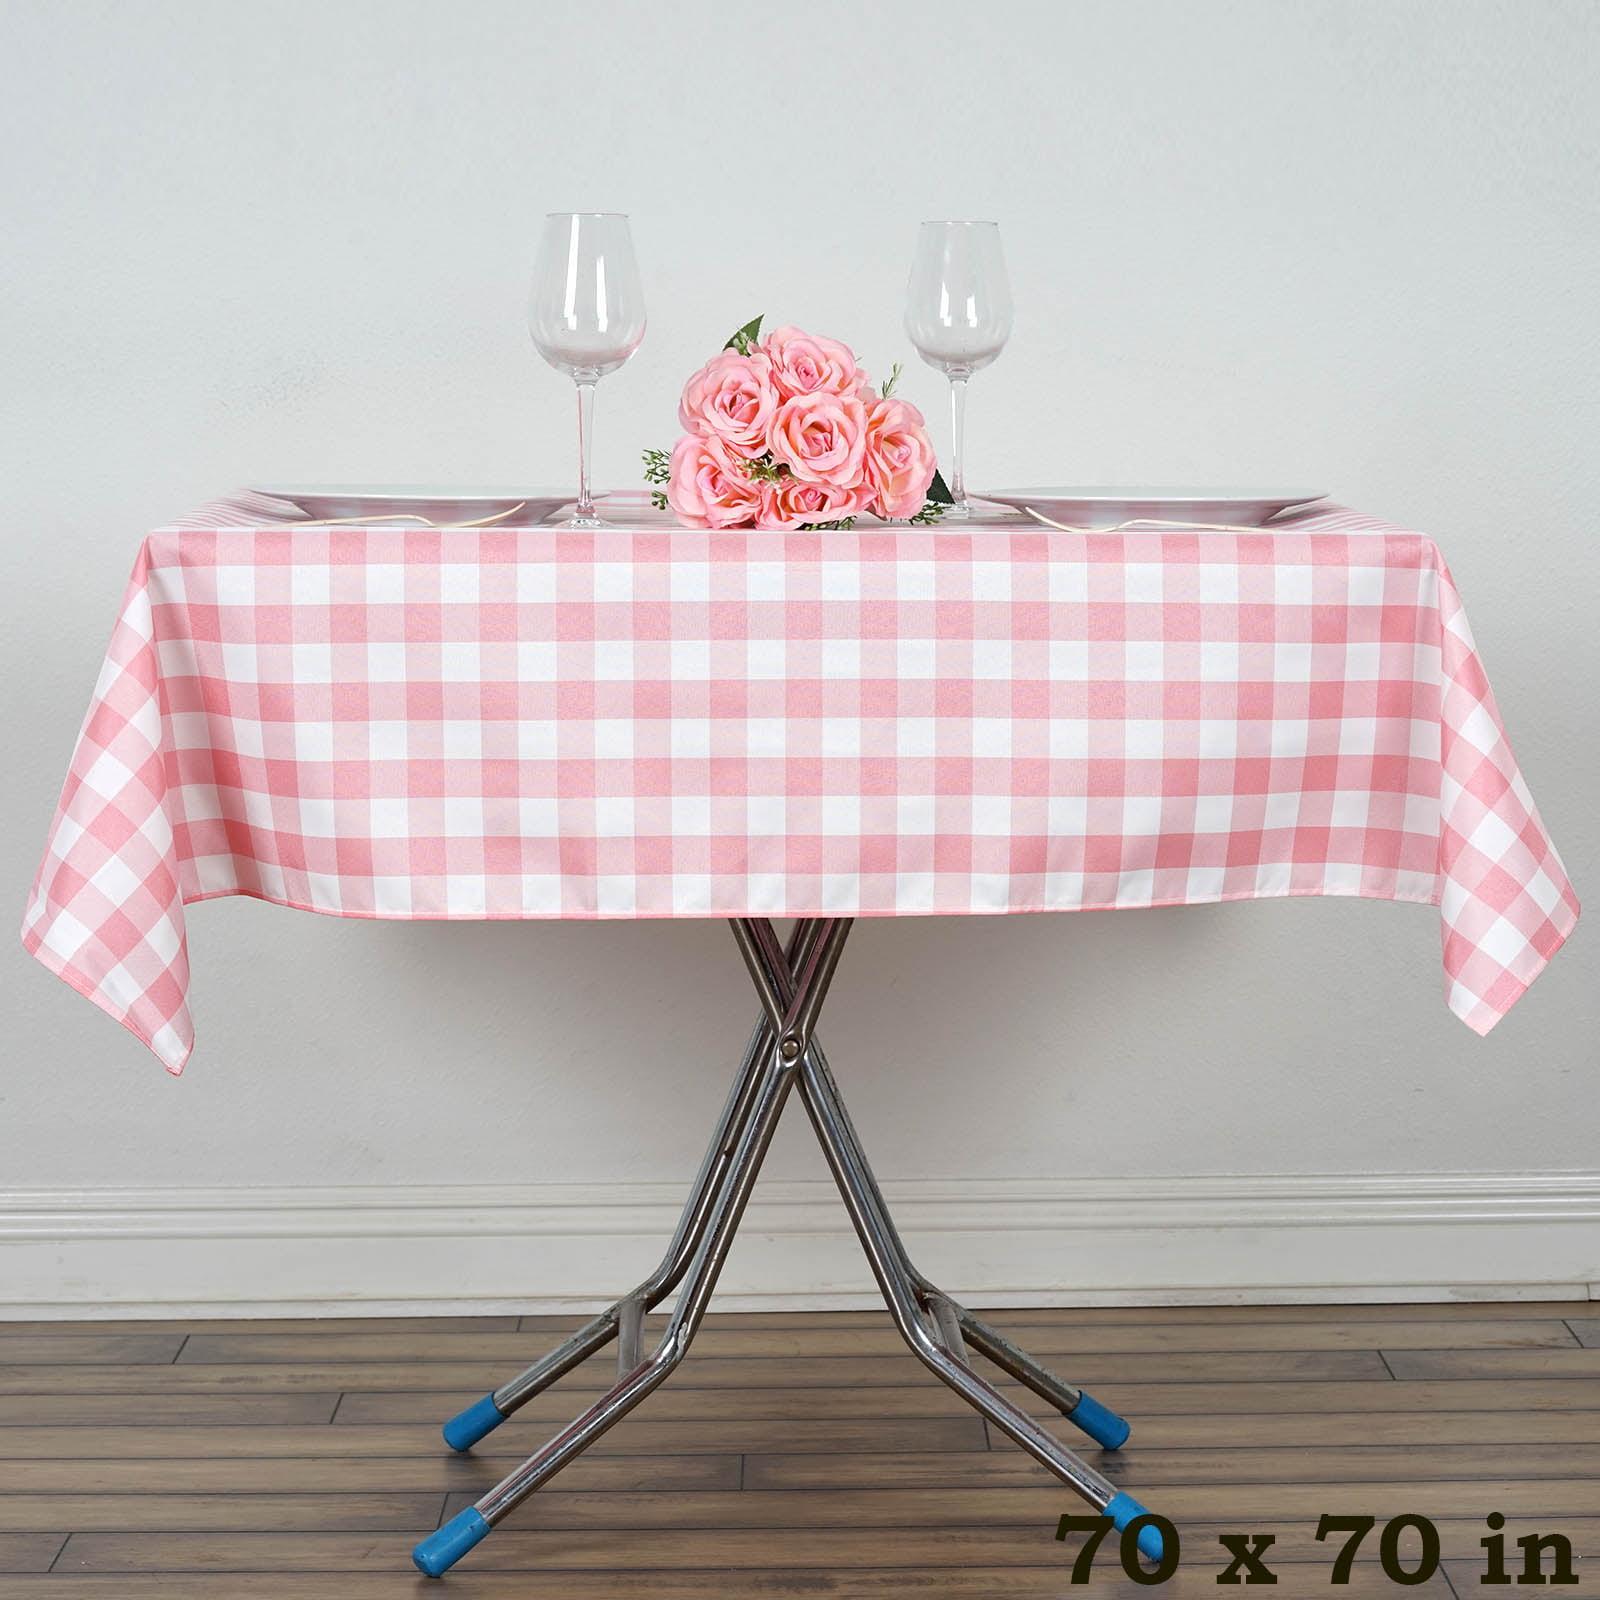 "BalsaCircle 70"" x 70"" Square Gingham Checkered Polyester Tablecloth for Garden... by BalsaCircle"